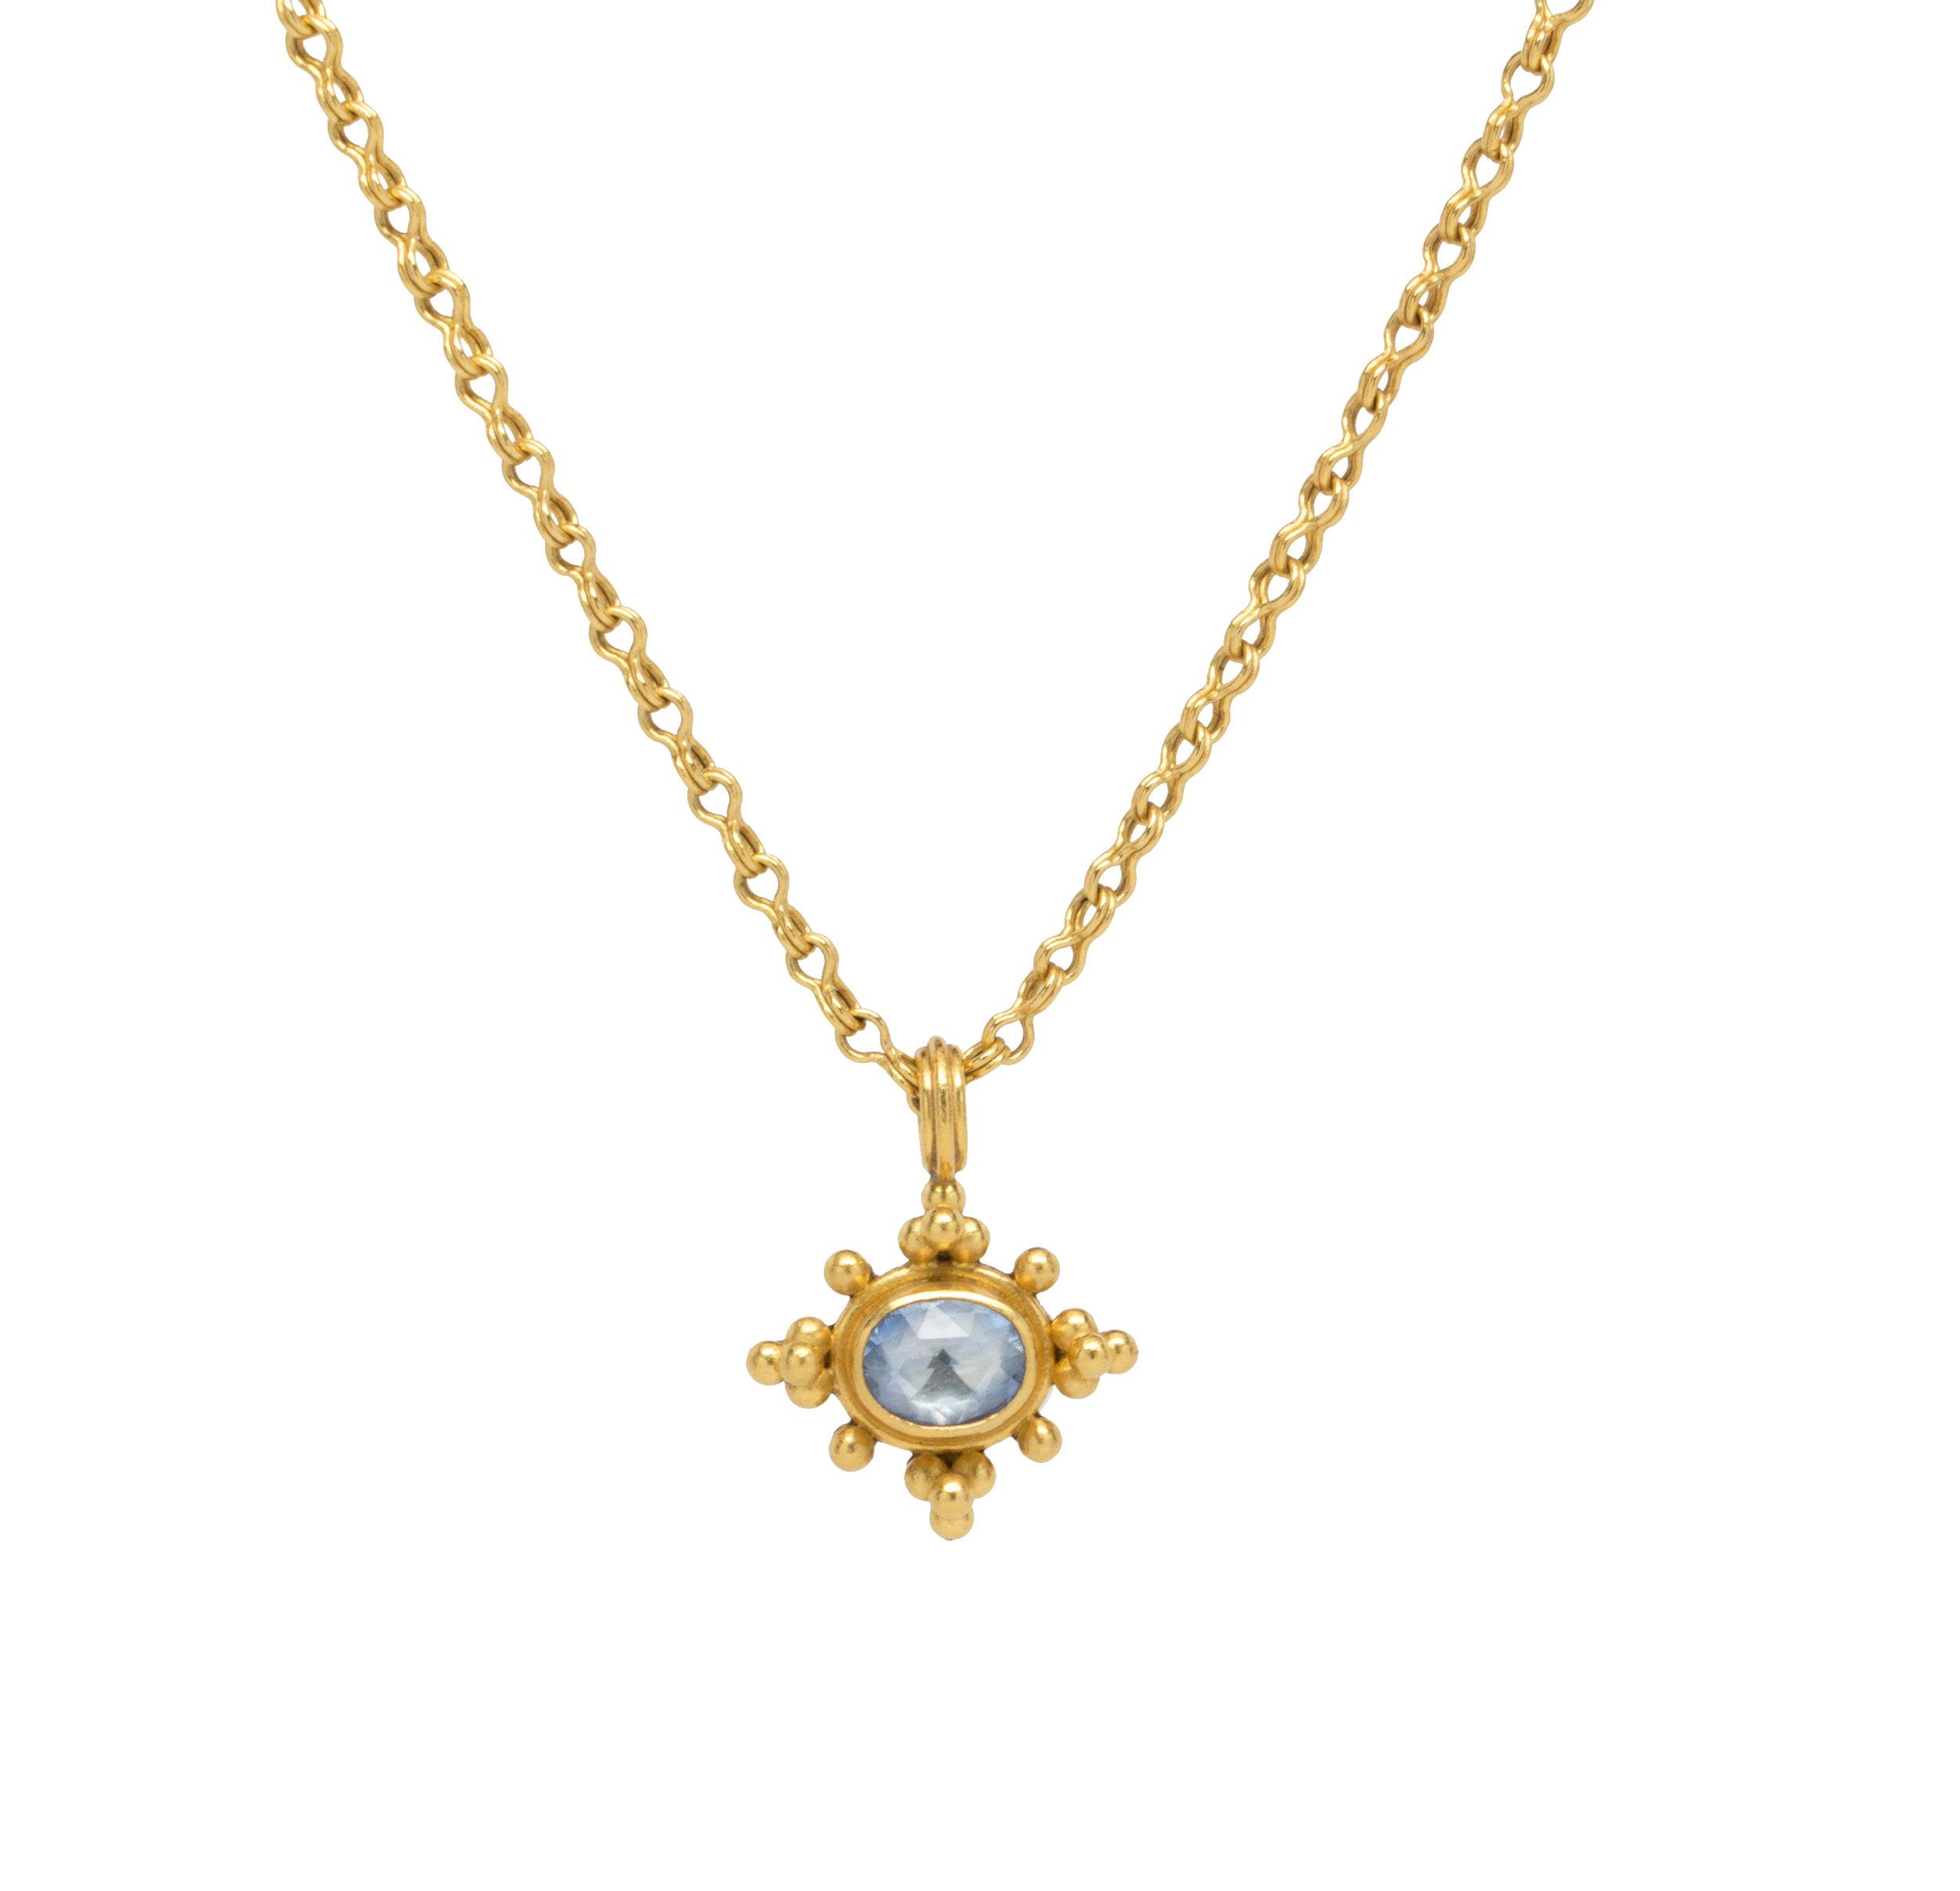 dec20 jewelry4-513.jpg